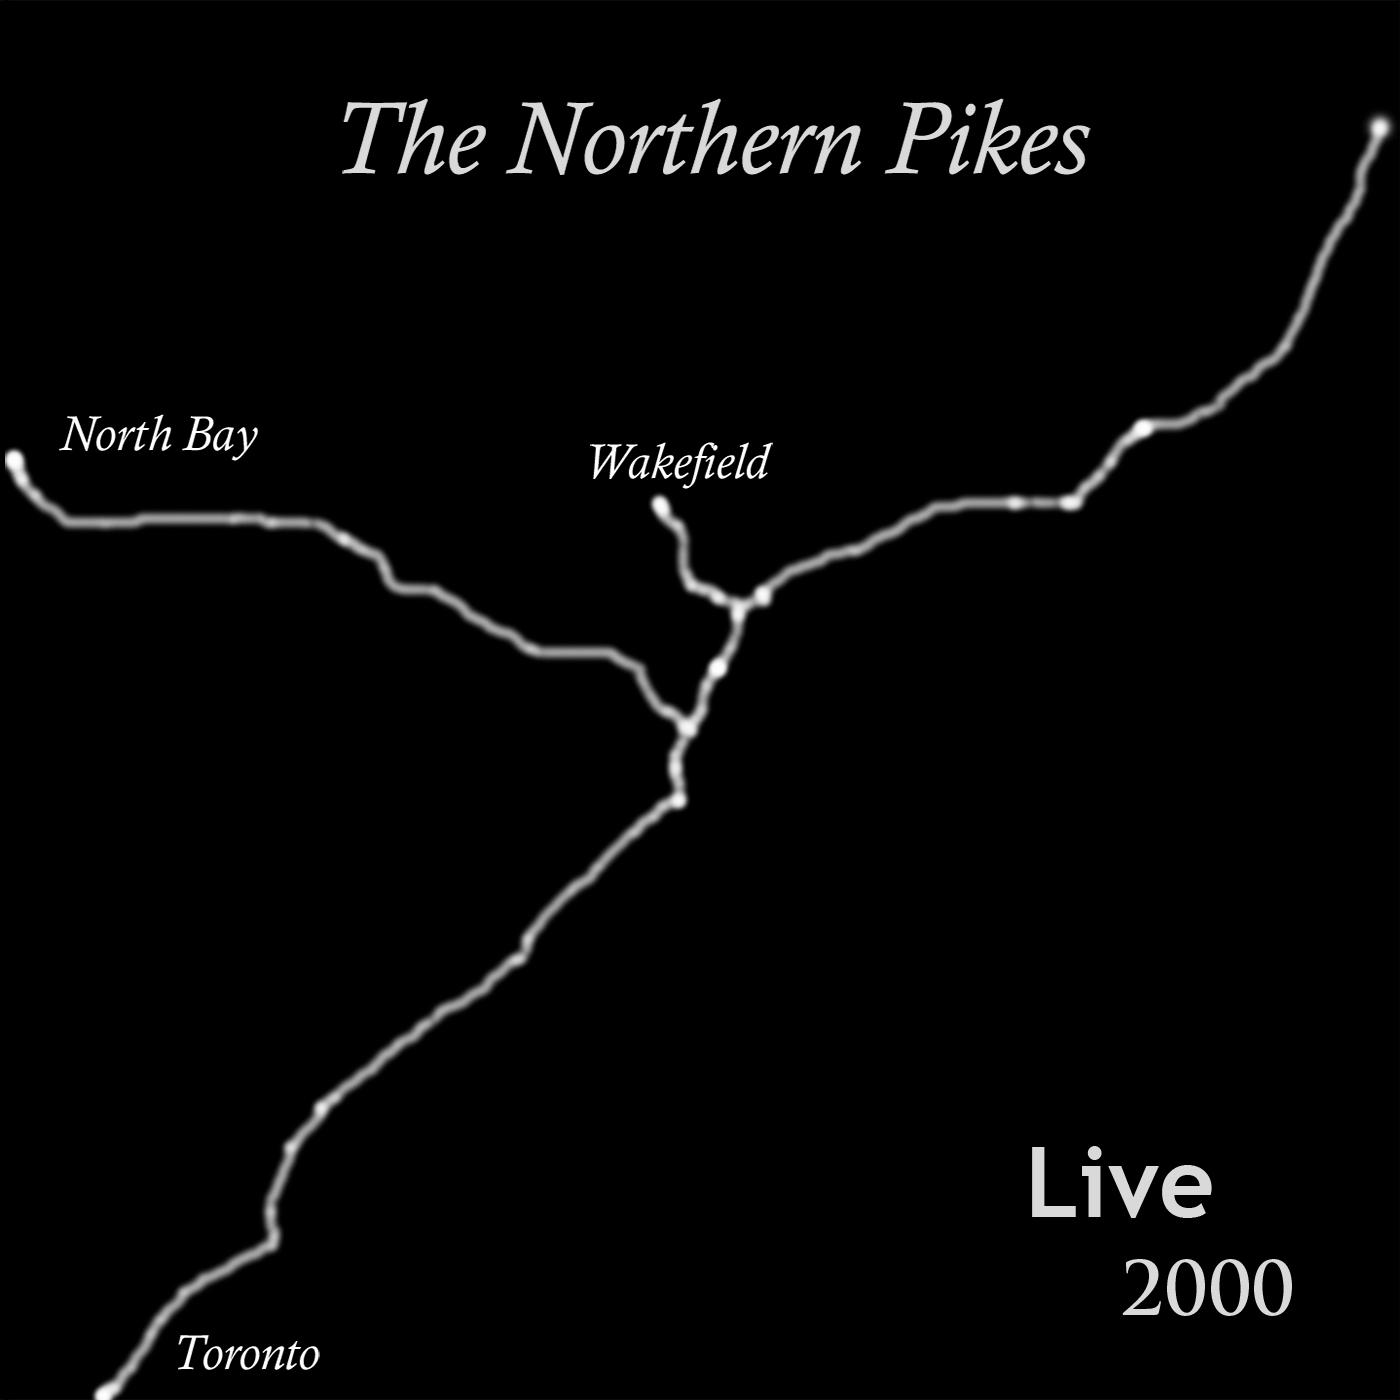 Live - June 2000